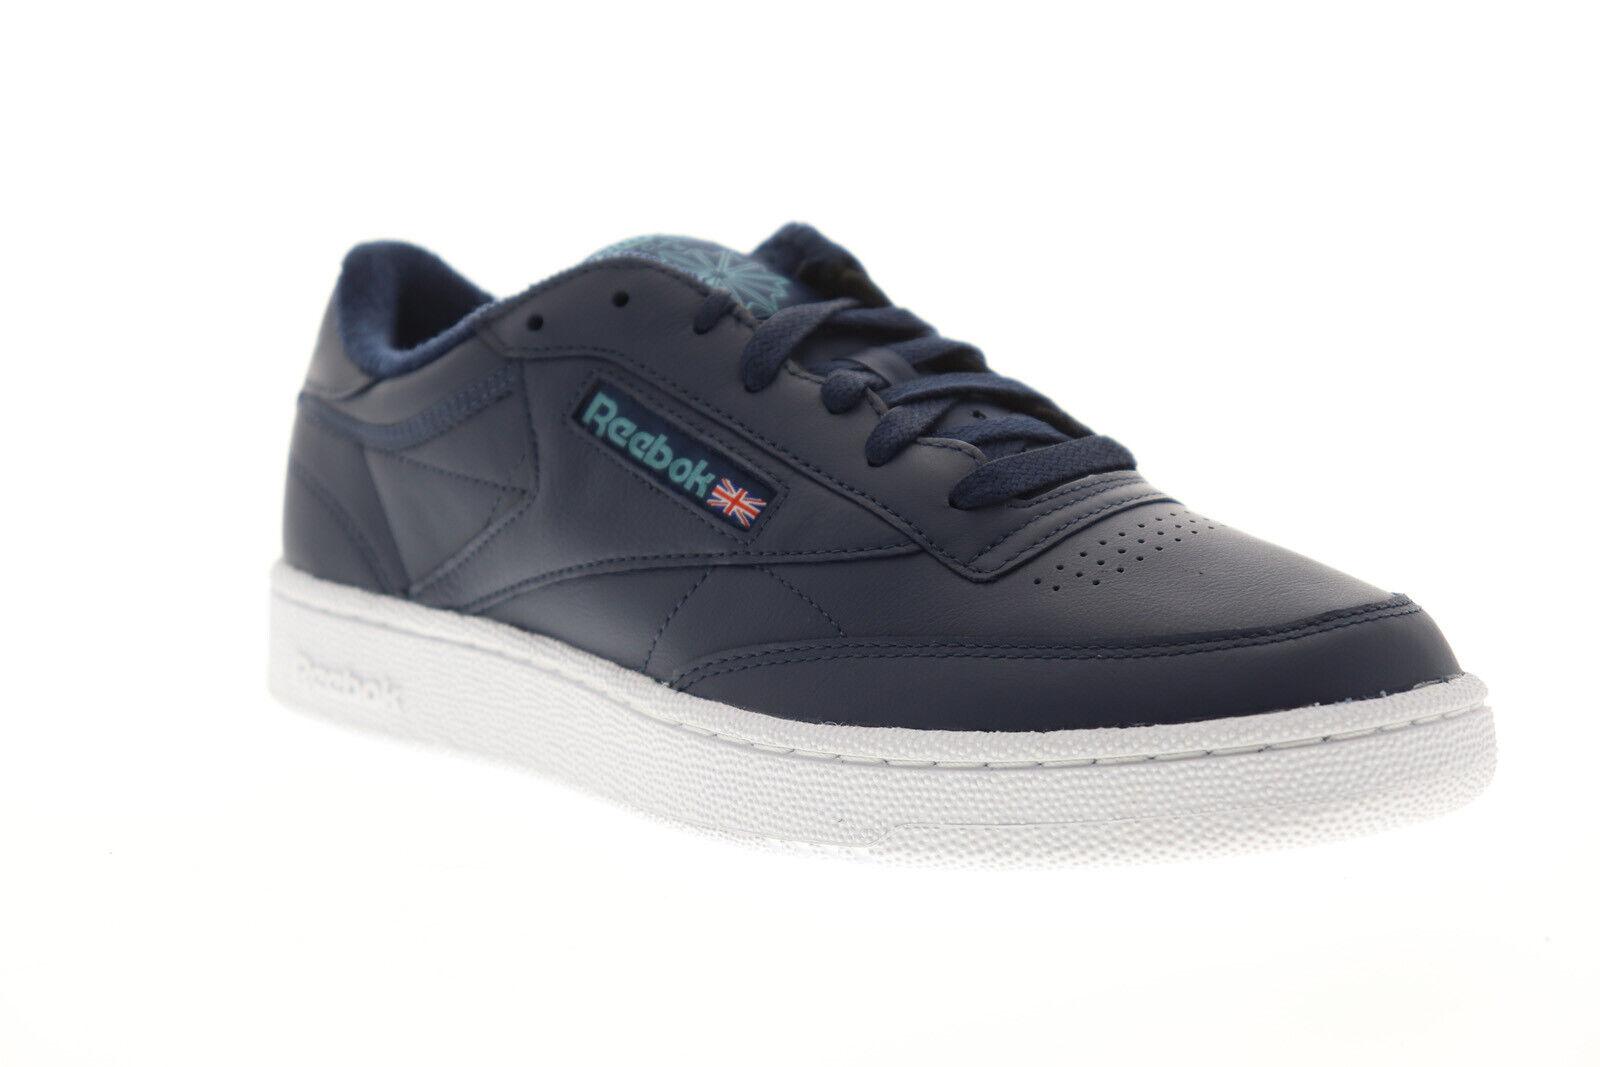 Reebok Club C 85 Mu DV3896 Mens bluee Leather Casual Low Top Sneakers shoes